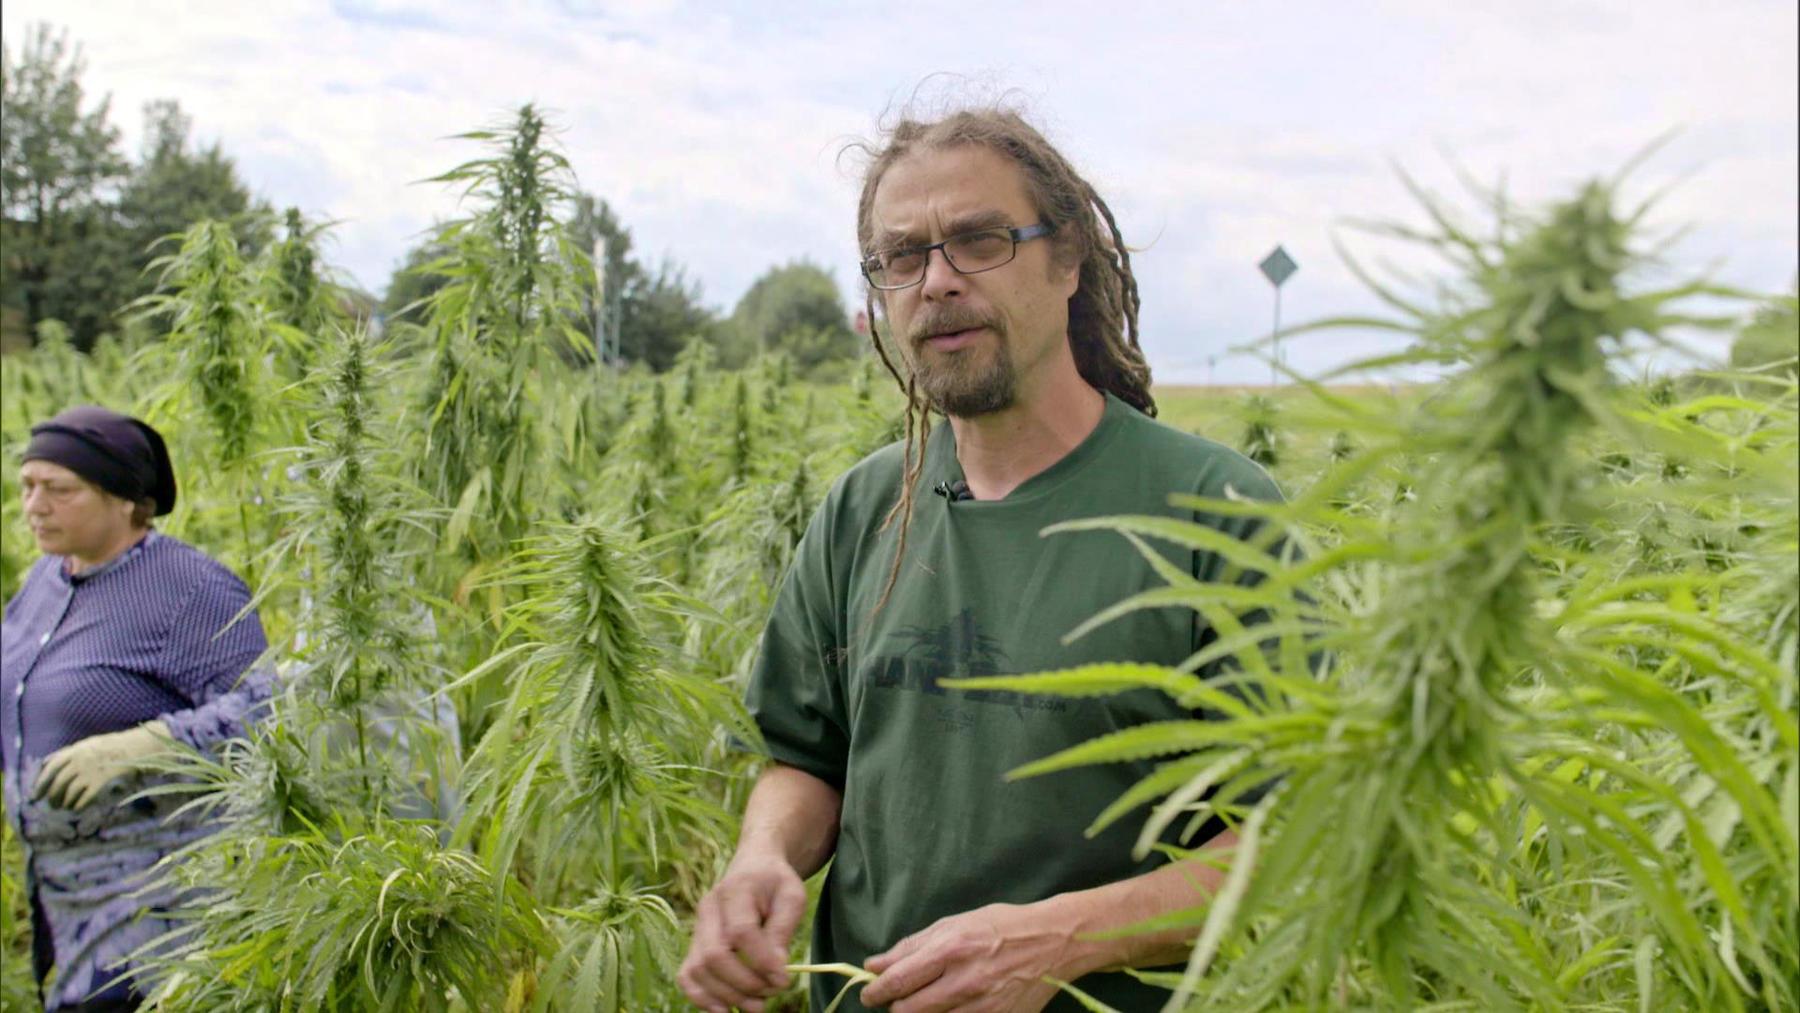 Cannabis - Droge oder Wundermittel?